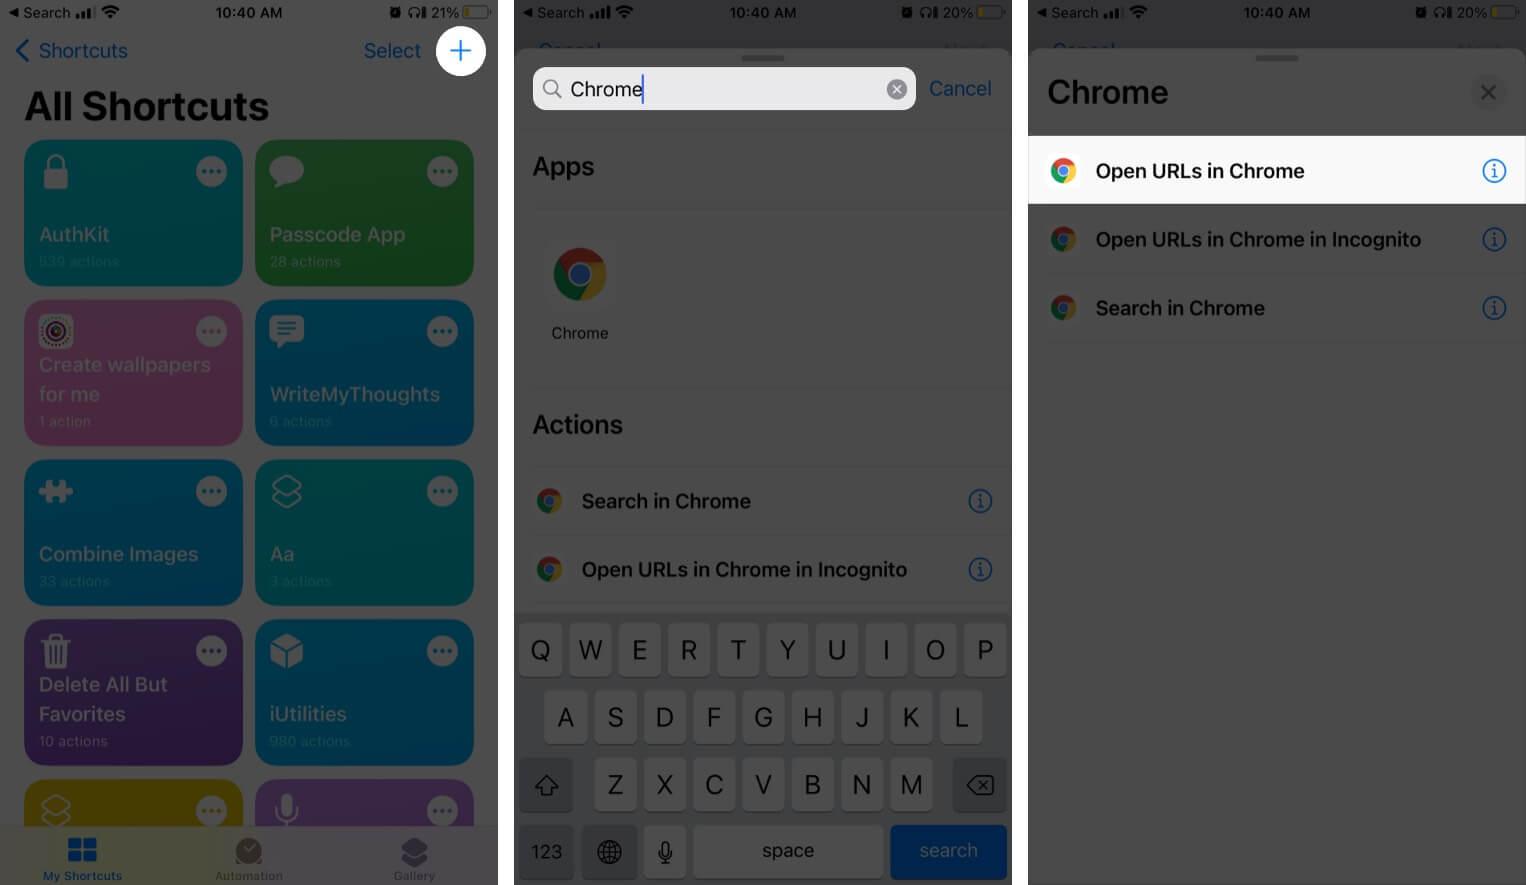 В приложении «Ярлыки» нажмите + и выполните поиск в Chrome на верхней панели iPhone.